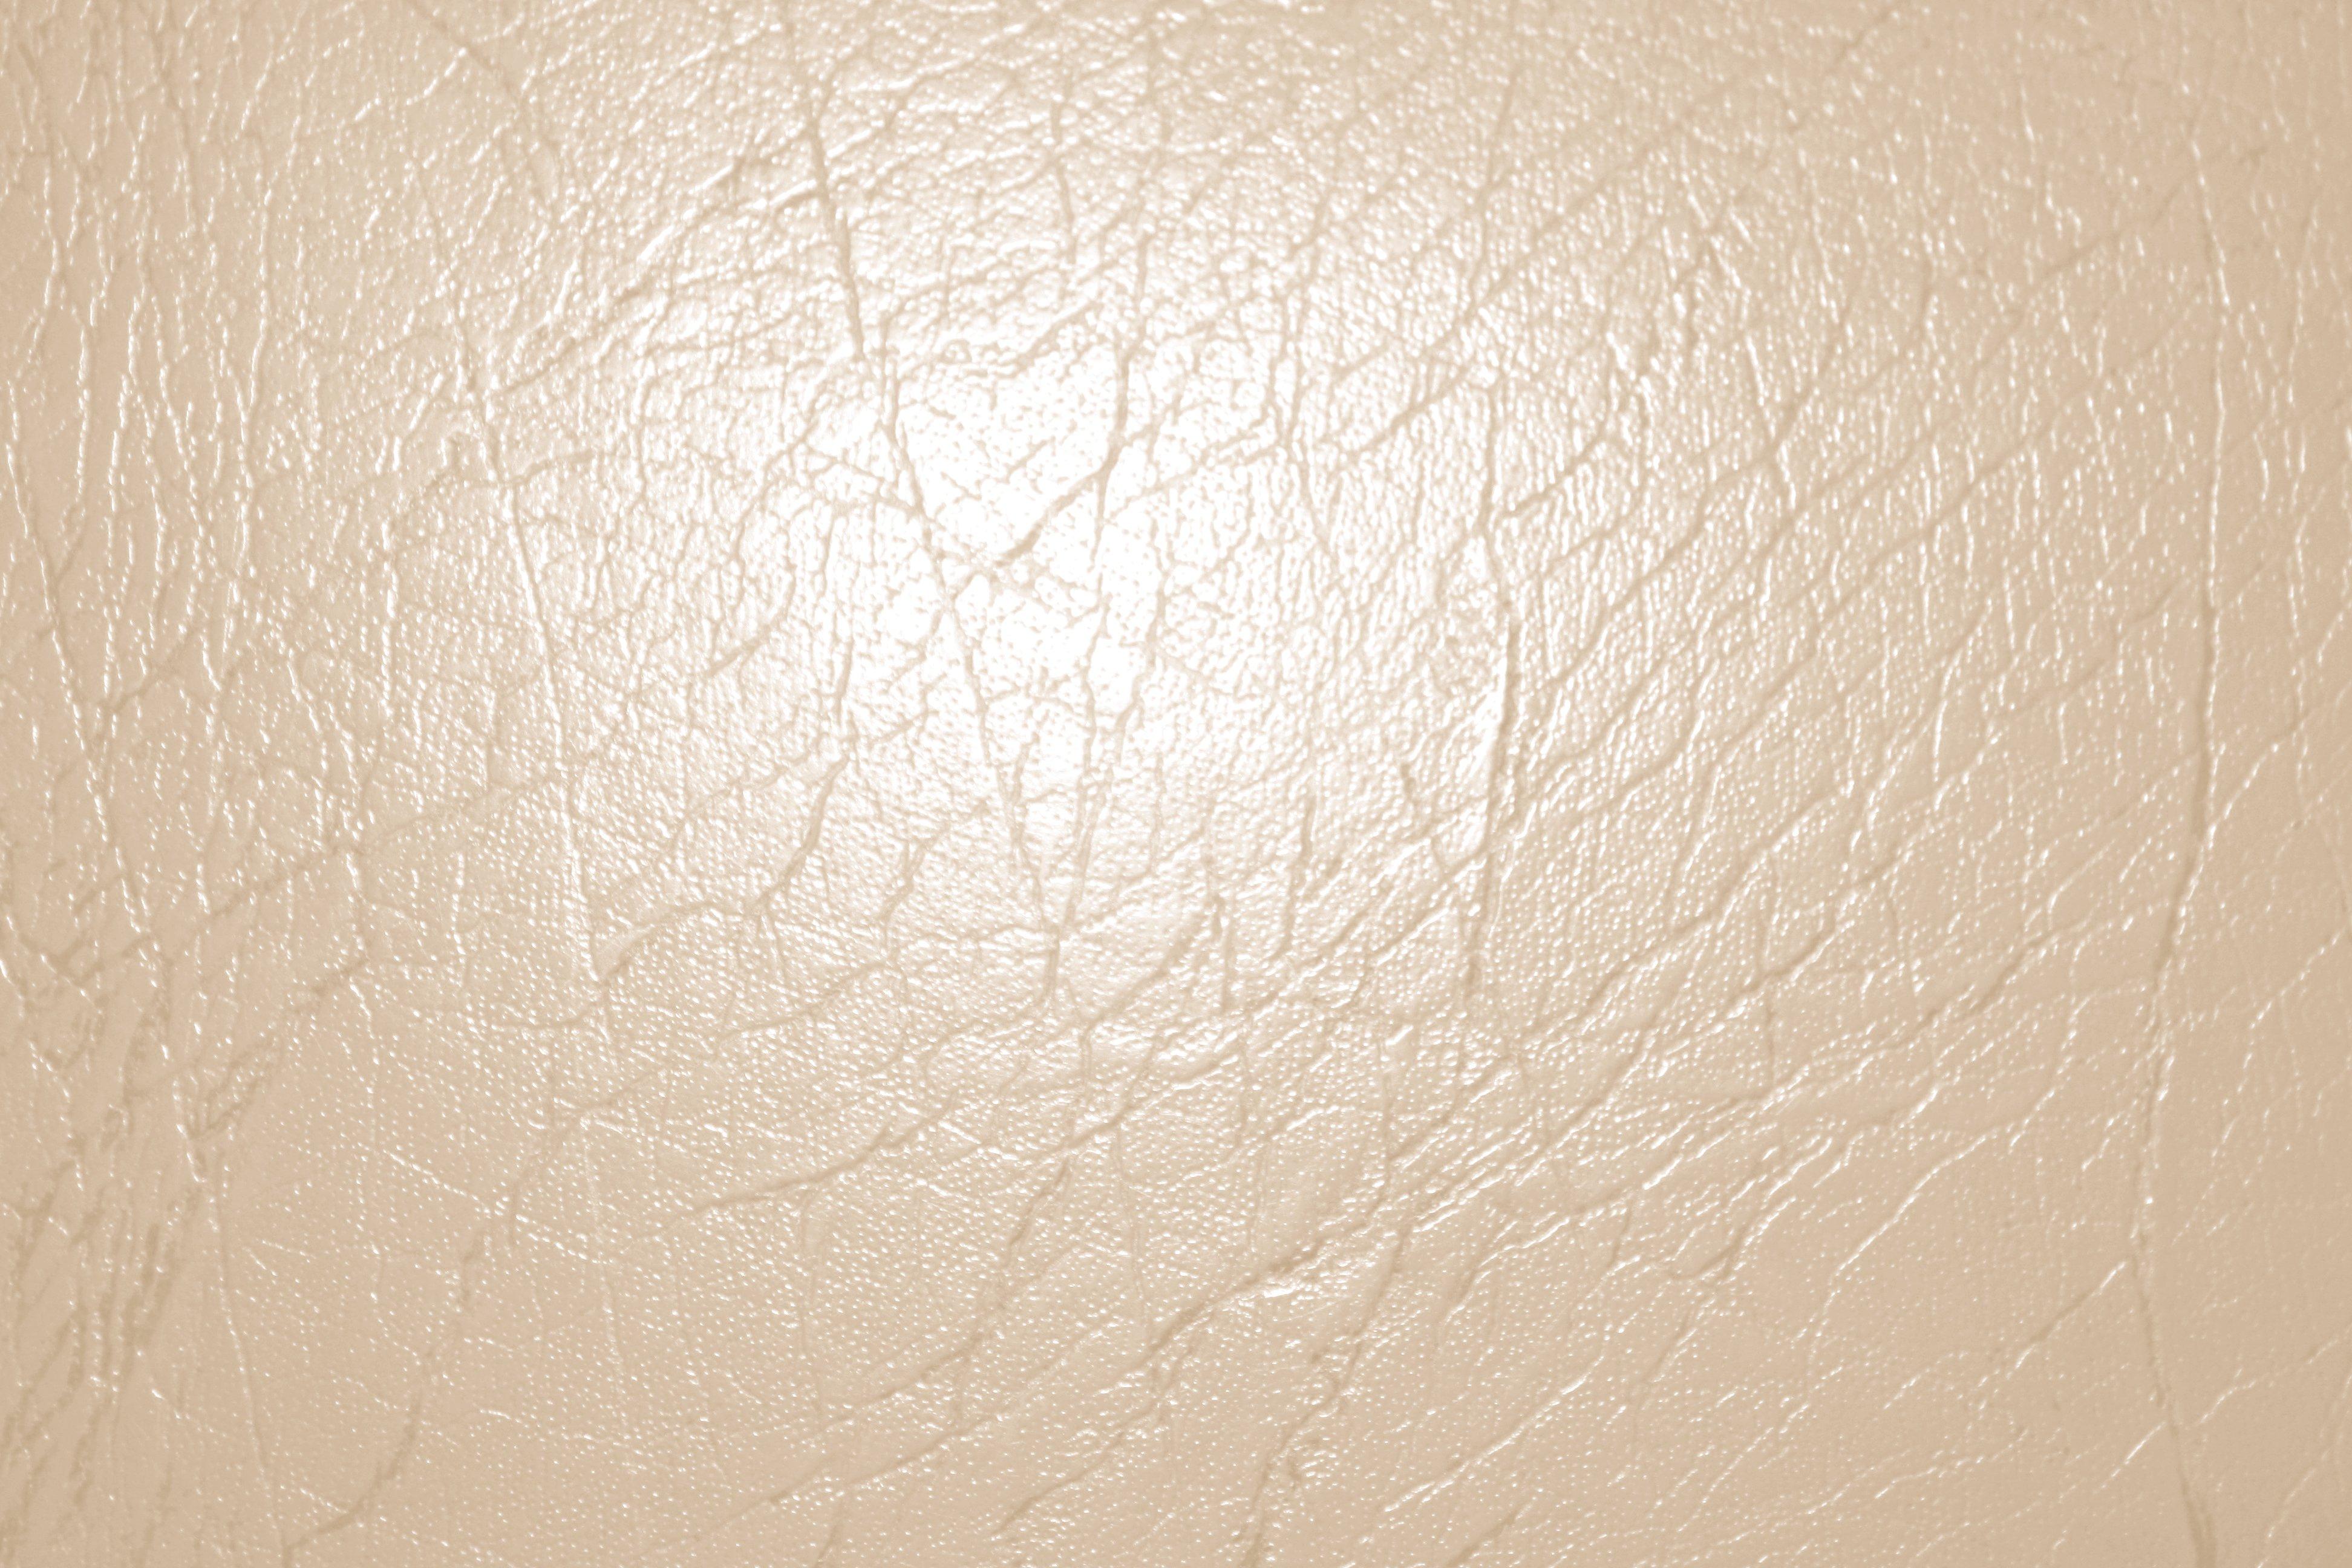 cream colored leather texturejpg 38882592 pixels Textures 3888x2592